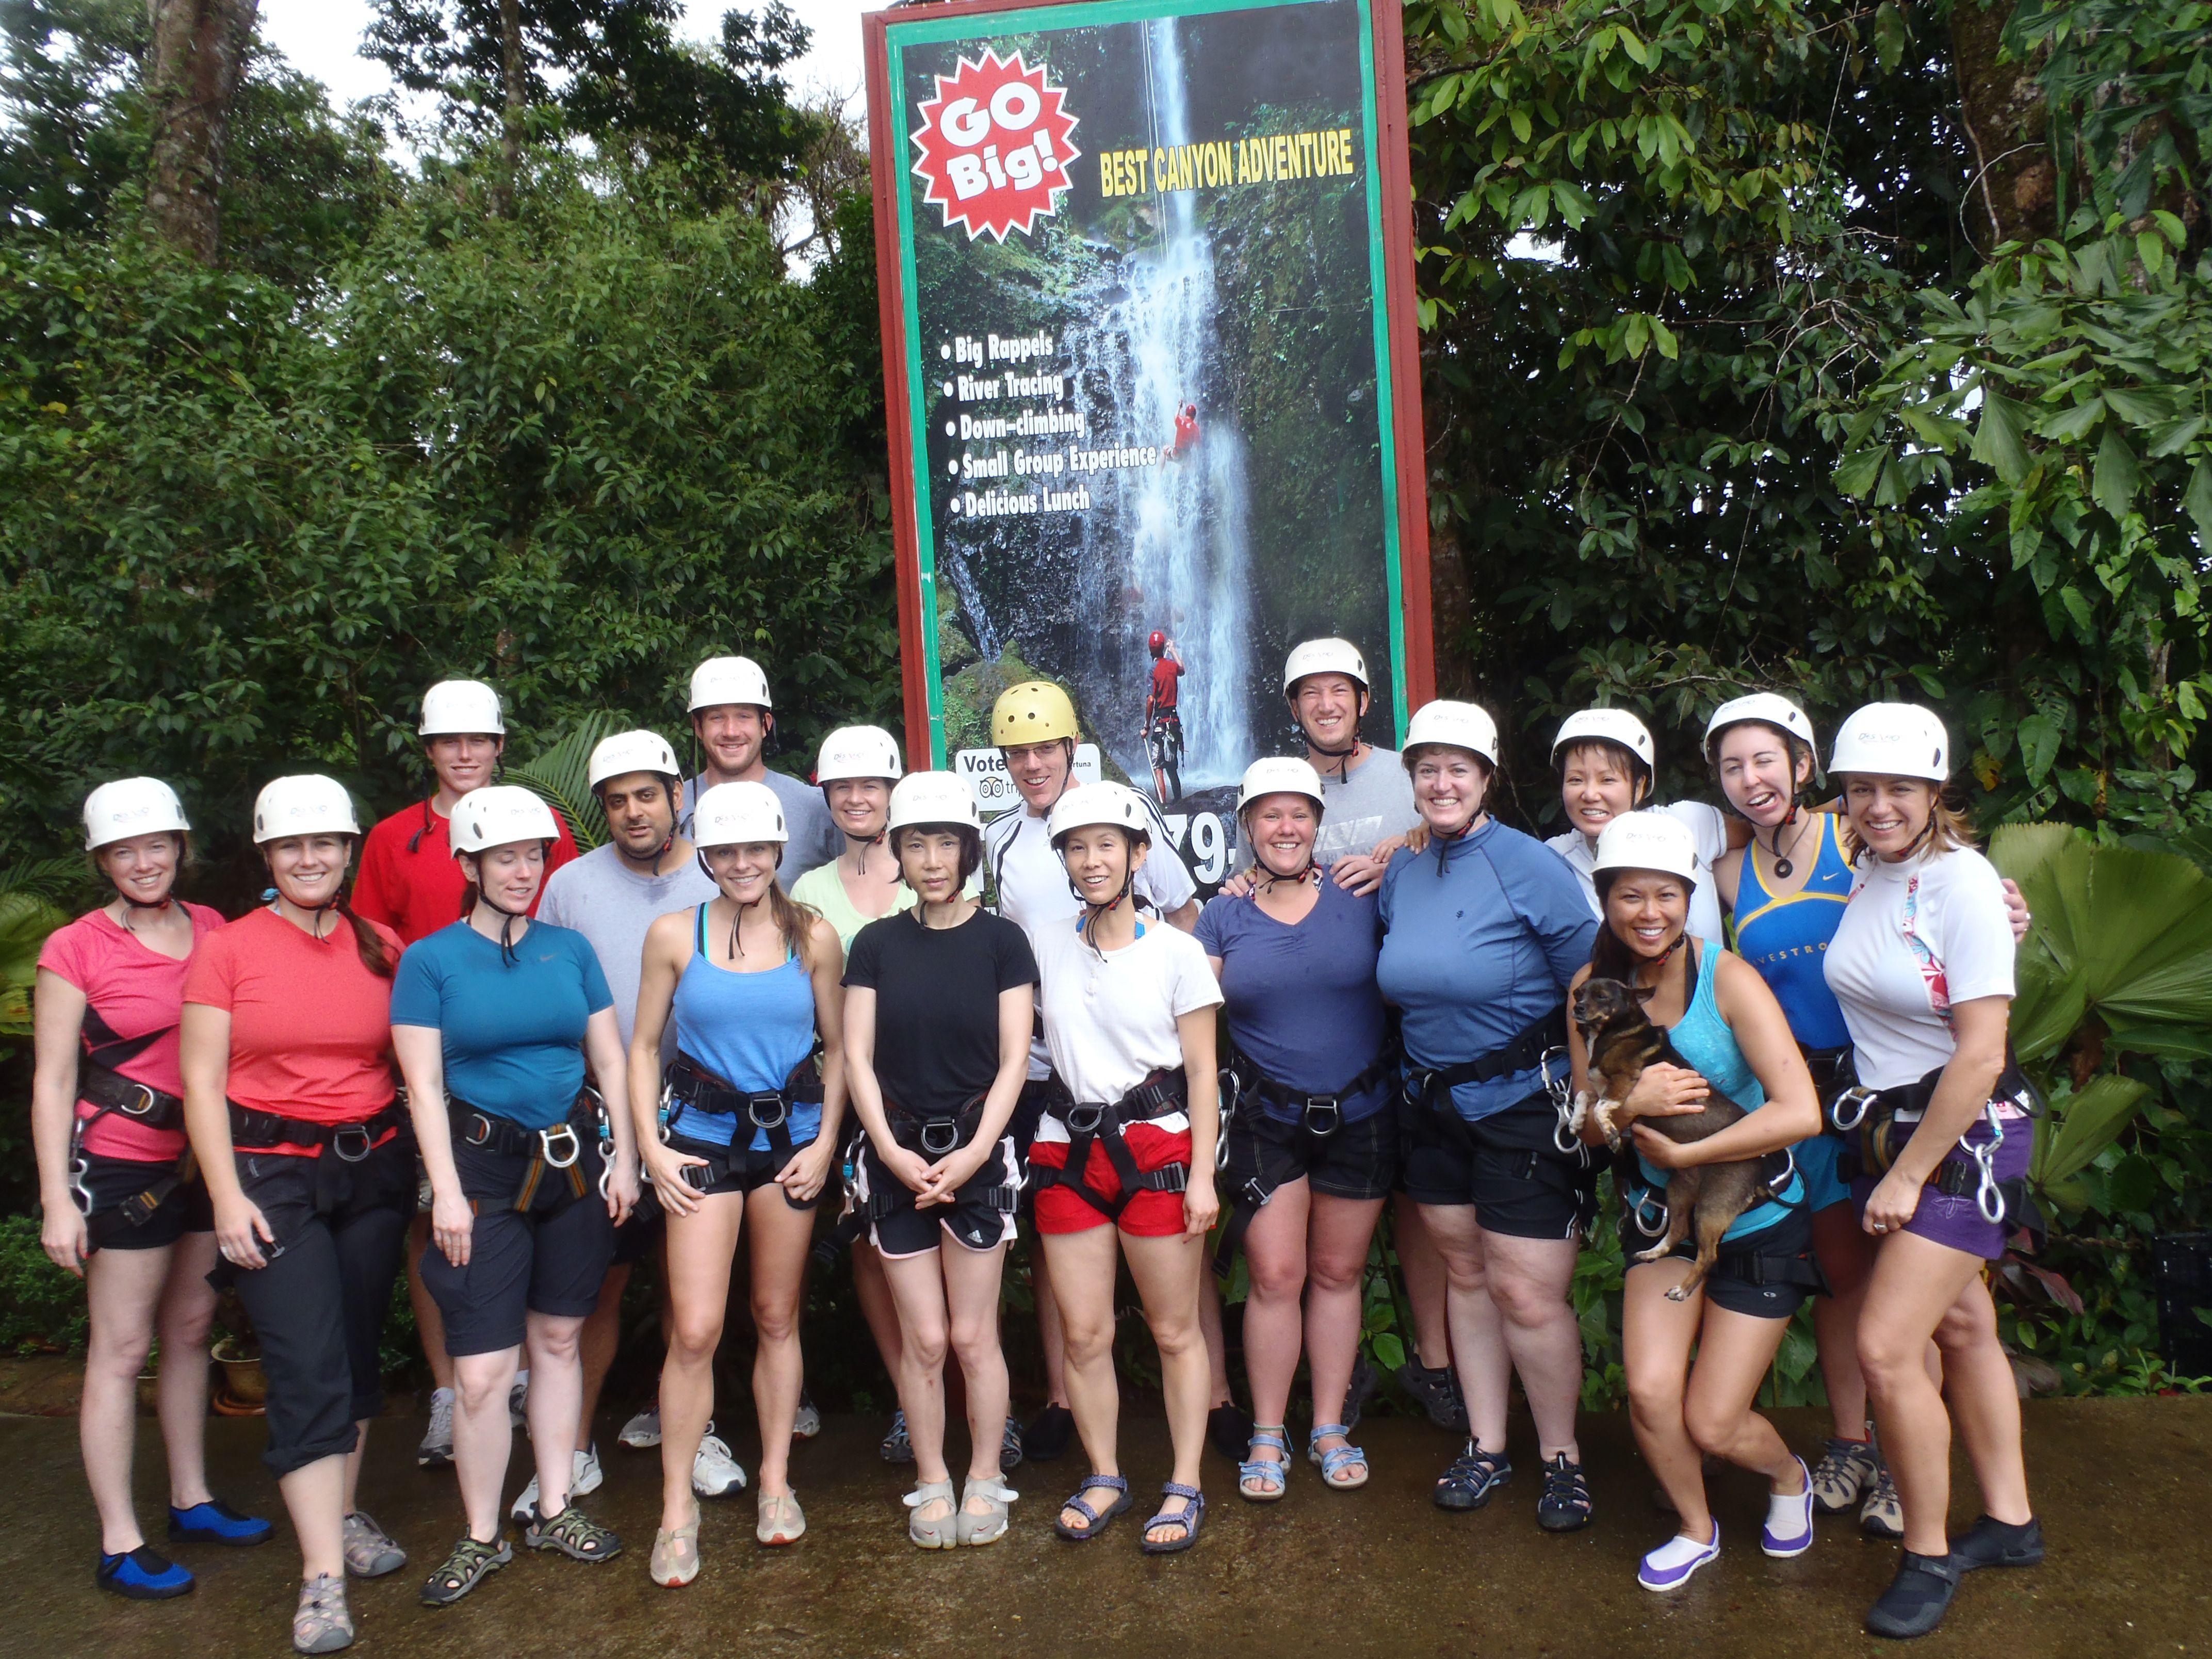 Vancouver International Adventure Travel Club